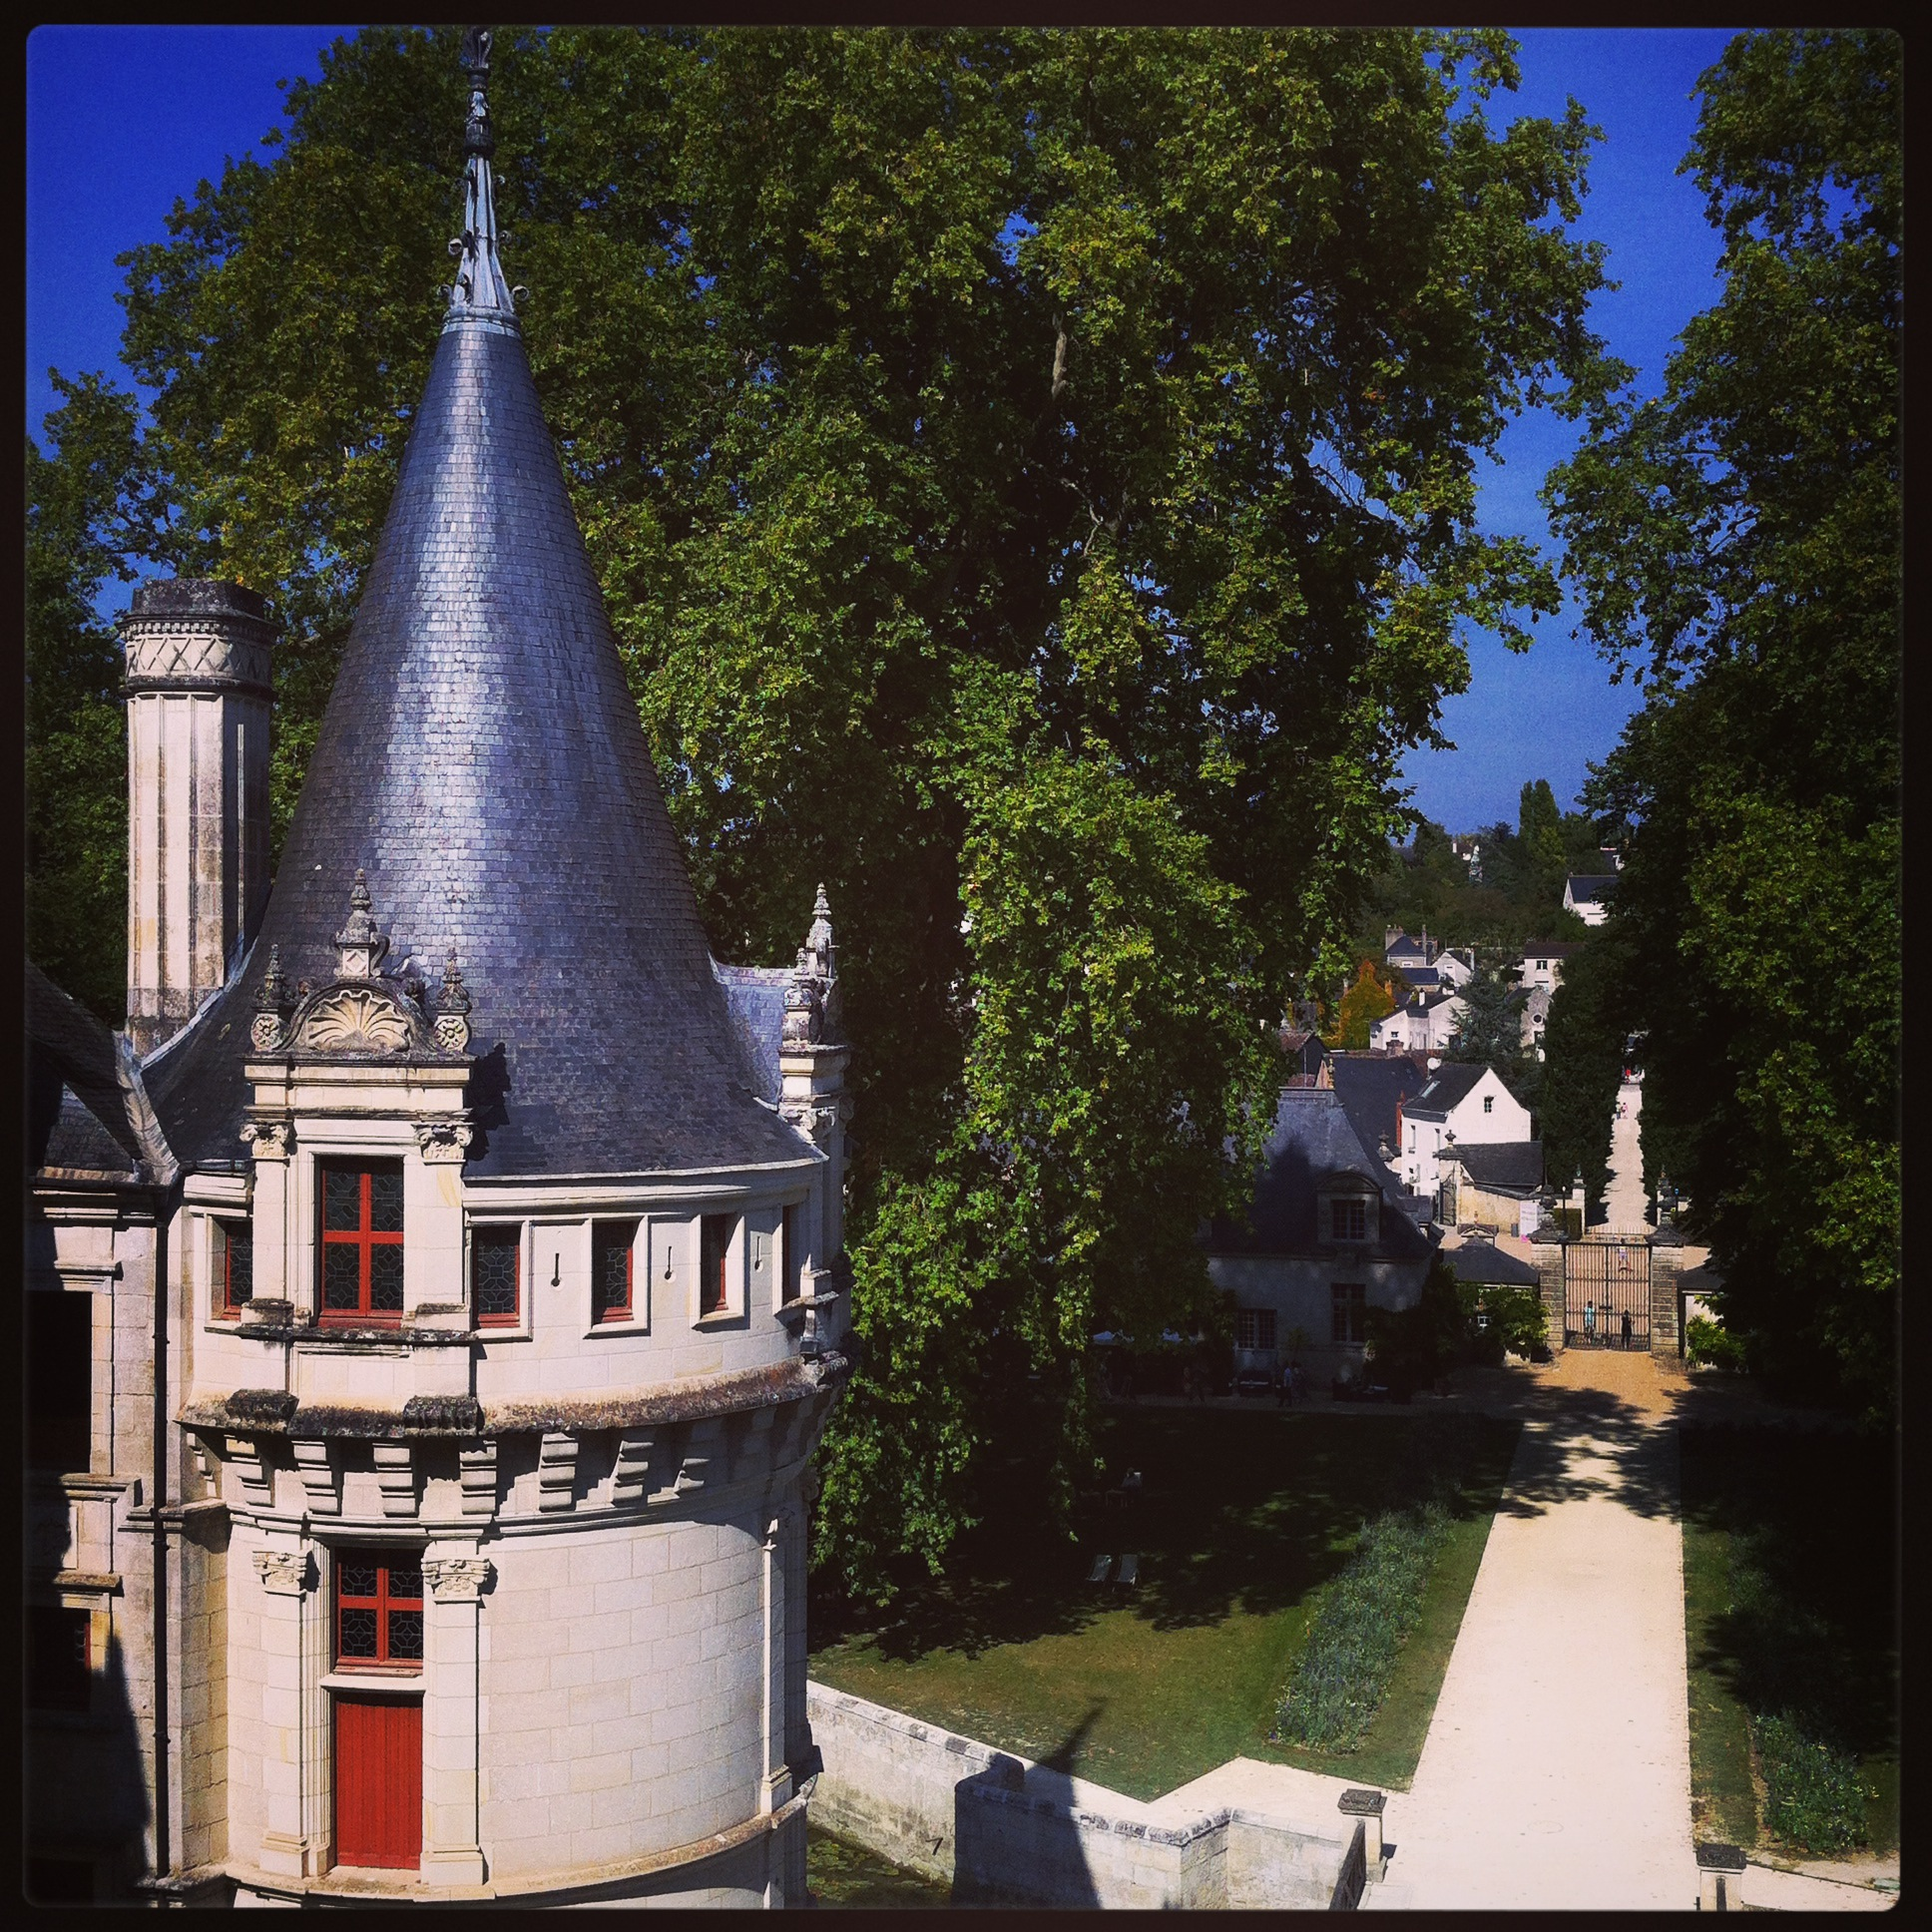 #VVR Azay-le-rideau 2